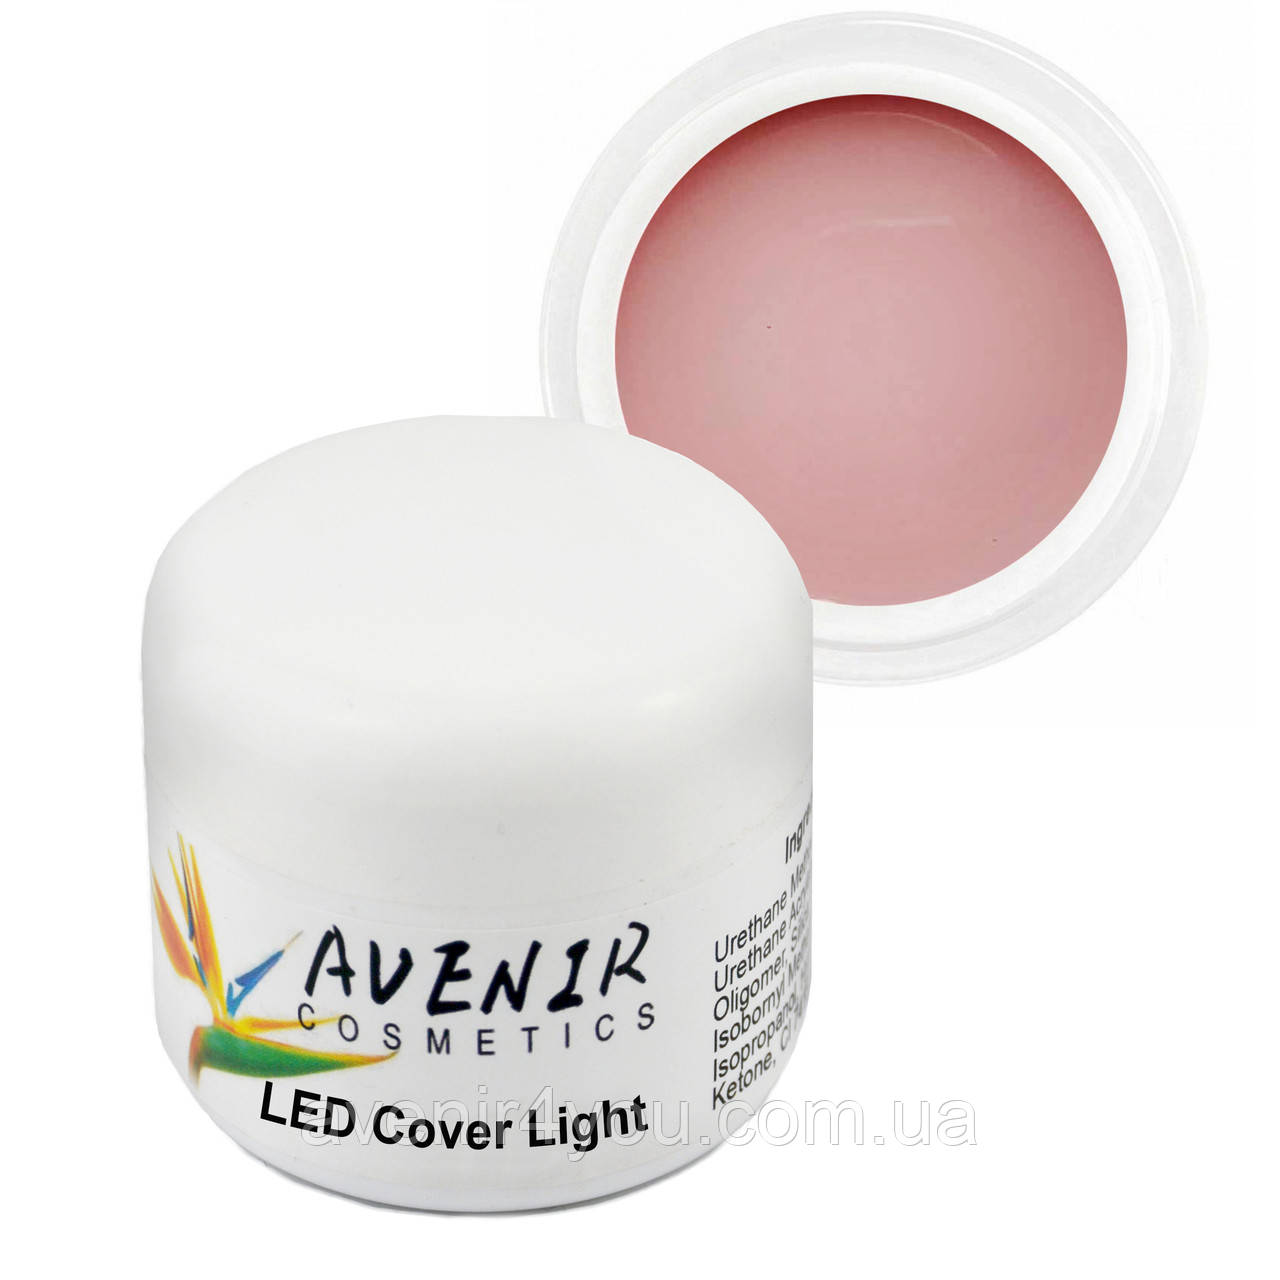 Гель для нарощування LED Cover Light Avenir 15 мл, 30 мл, 50 мл